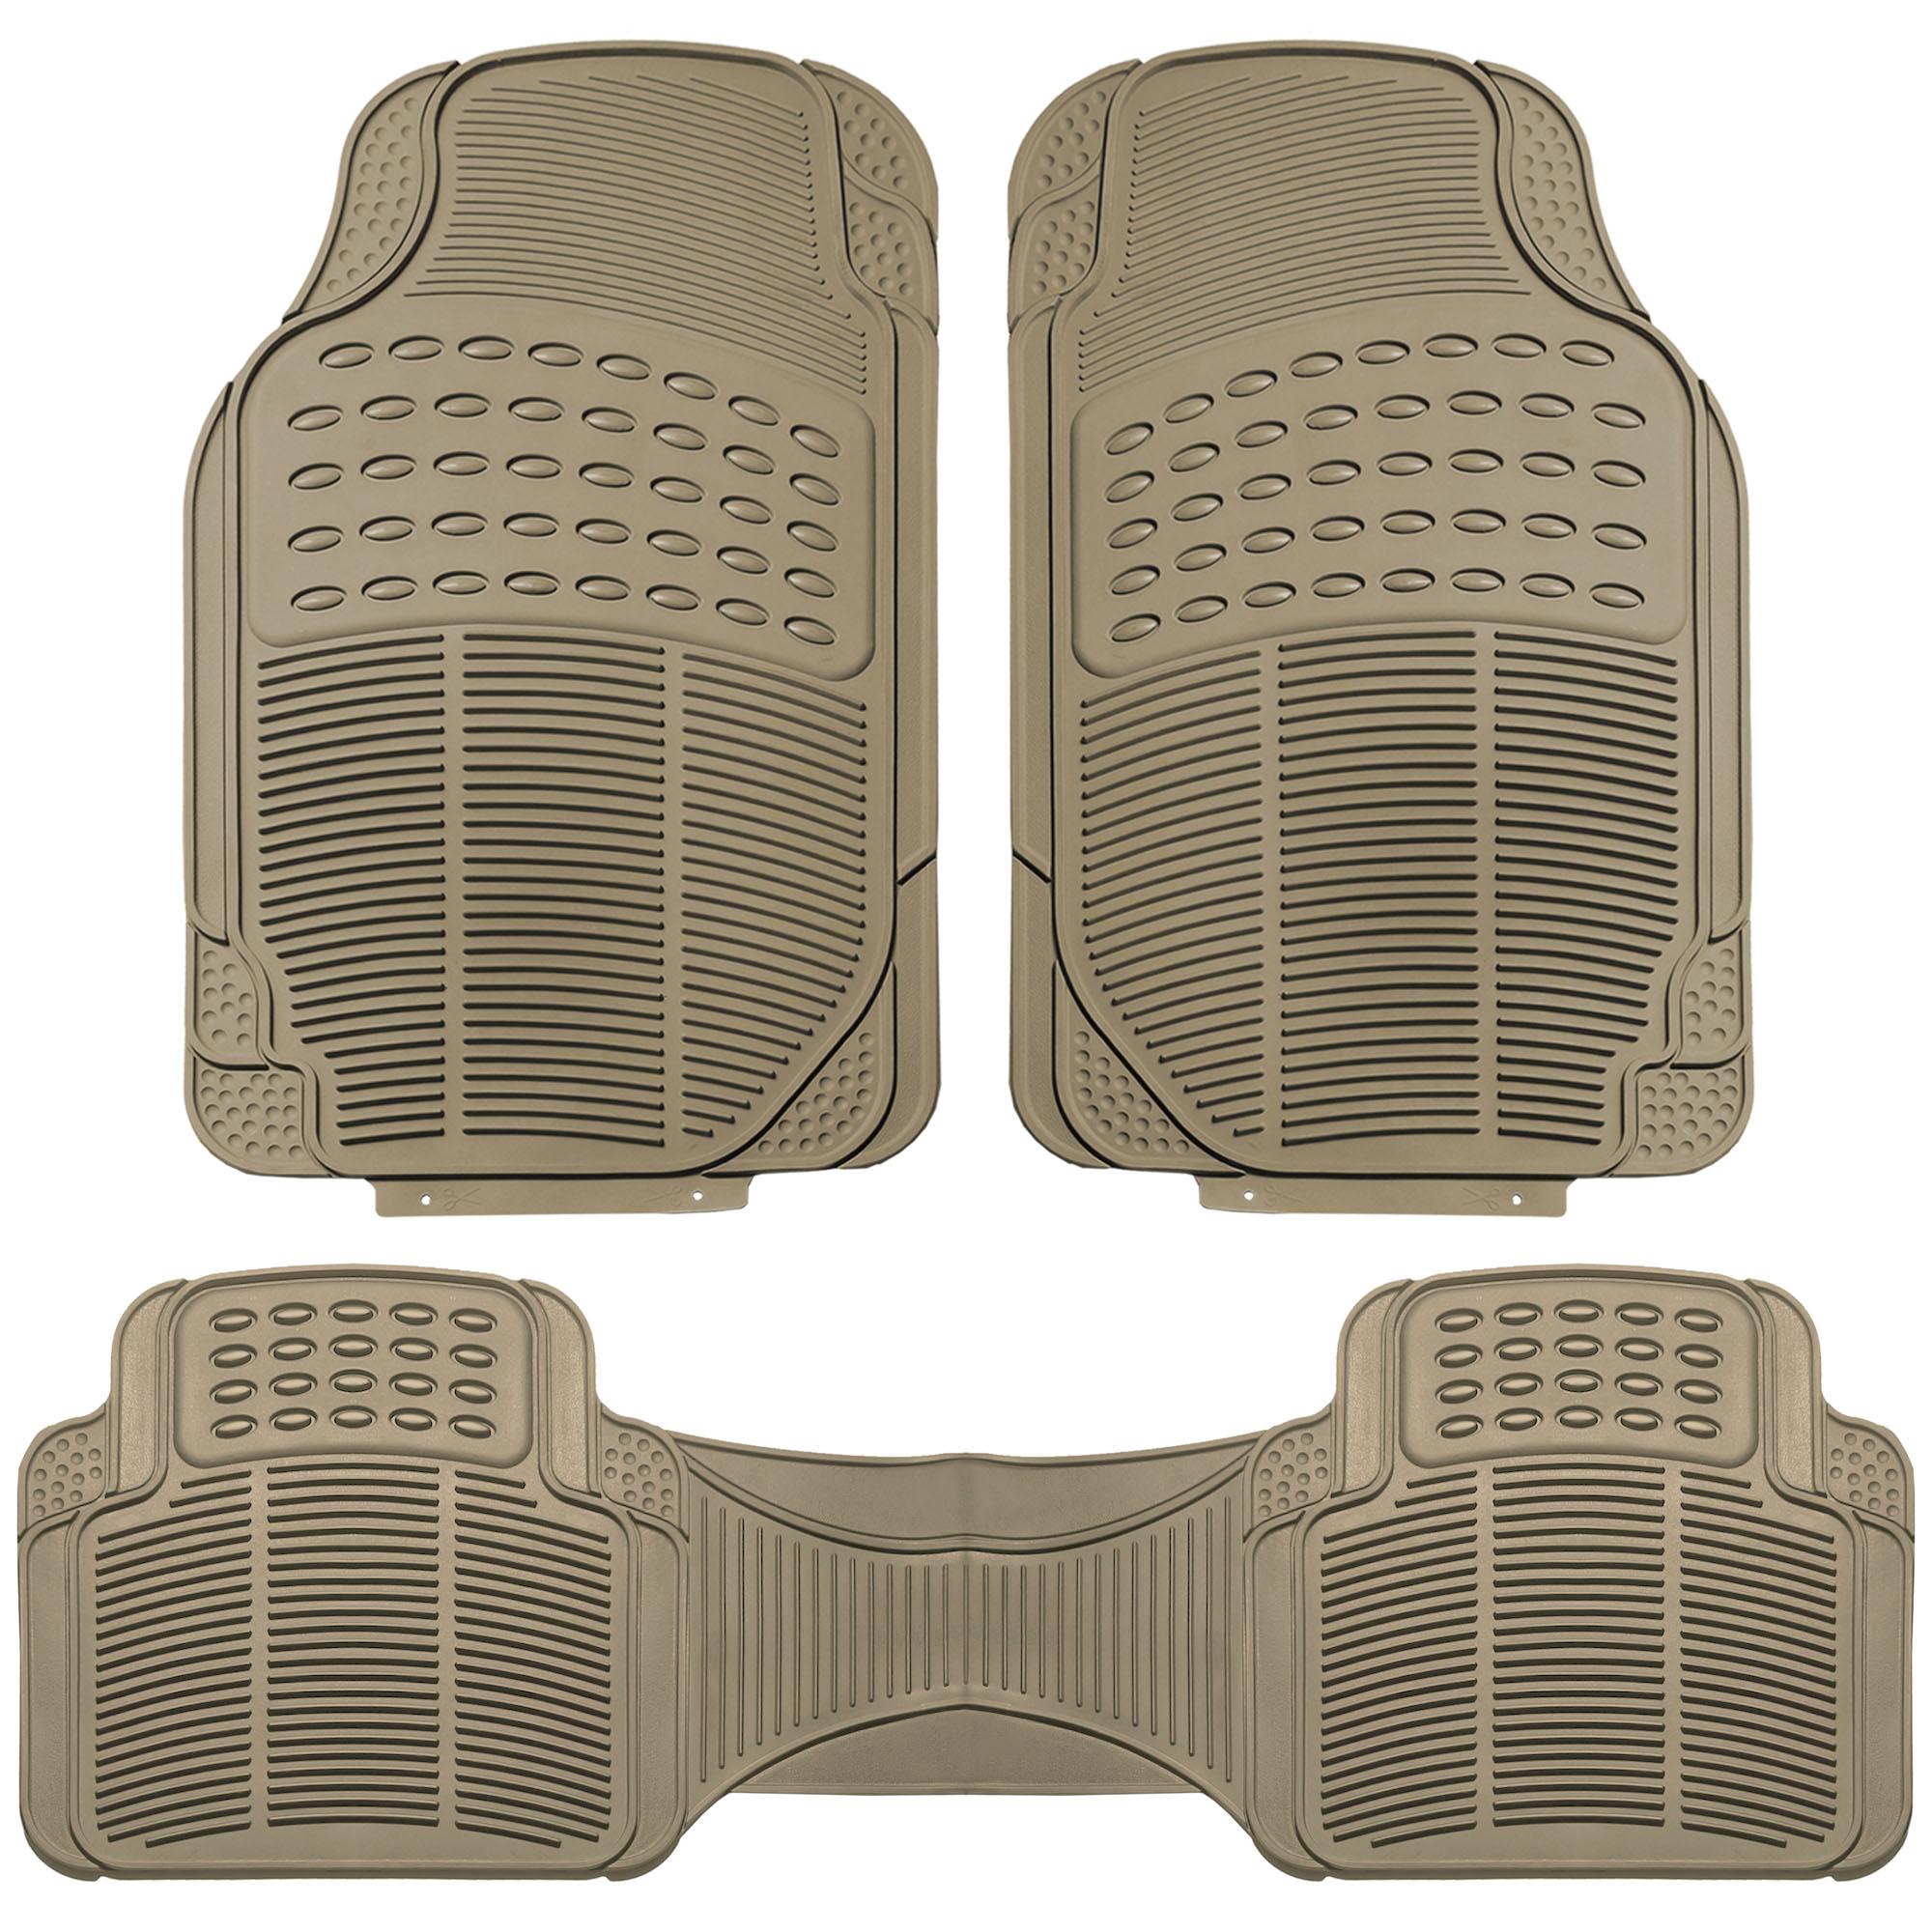 3pc-Floor-Mats-for-Auto-Car-SUV-Van-Heavy-Duty-3-Colors-w-Free-Gift thumbnail 4